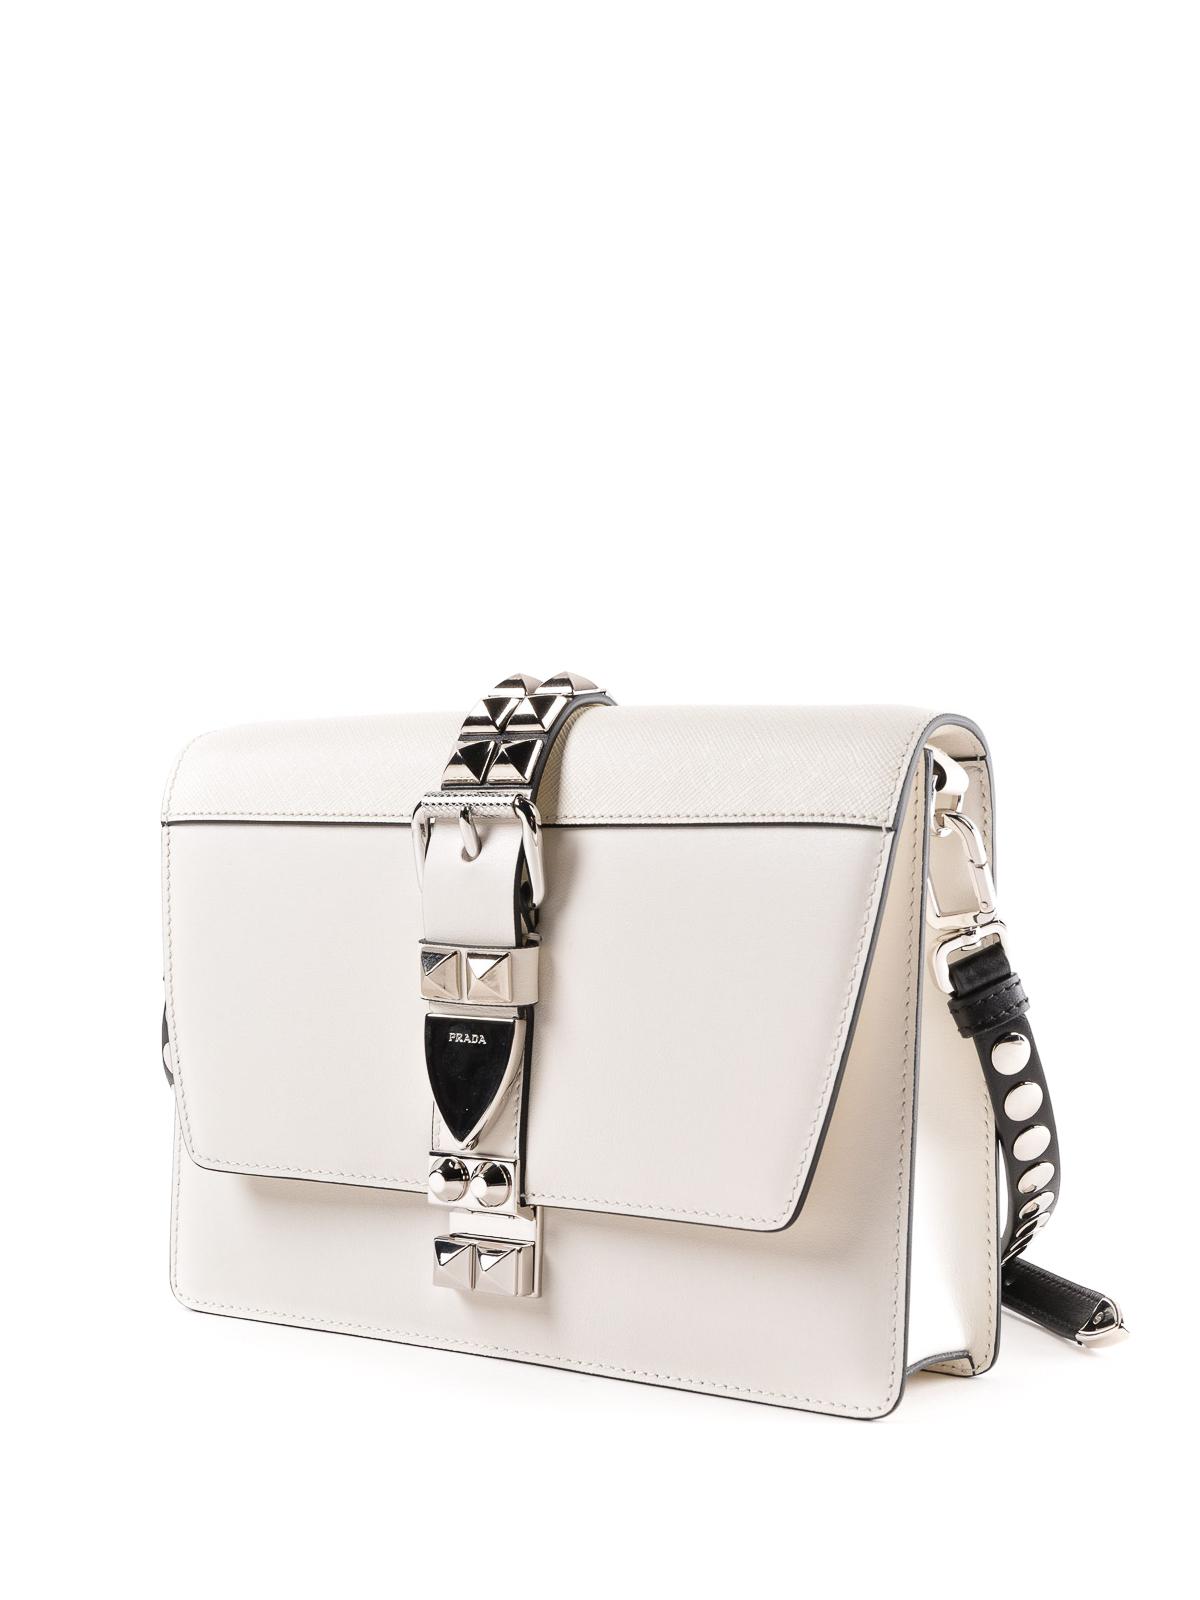 65d49cca4ddd Prada - Elektra white leather bag - cross body bags - 1BD1202BB0VOBH964